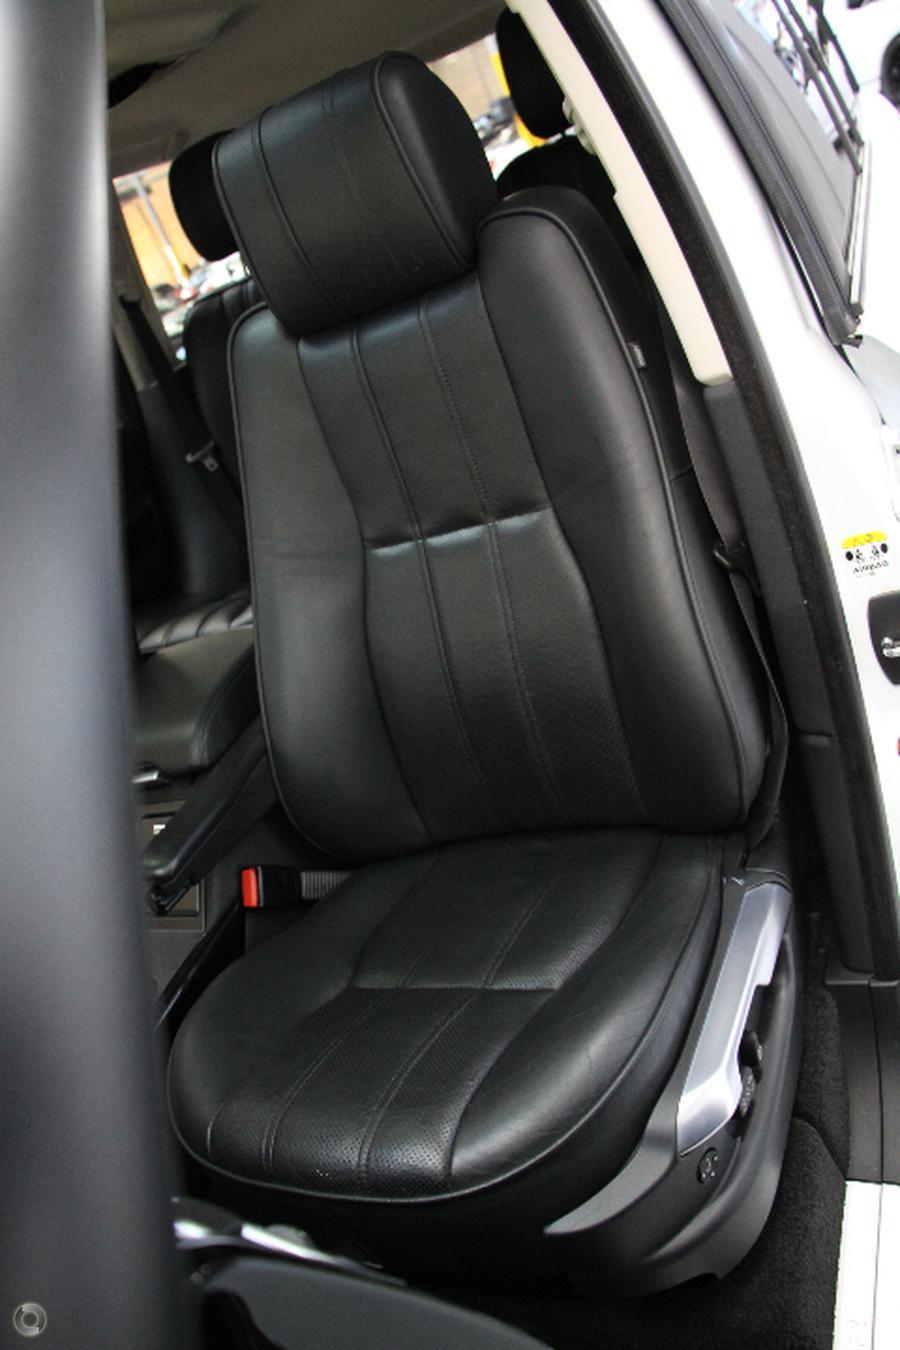 2010 Land Rover Range Rover Vogue TDV8 Luxury L322